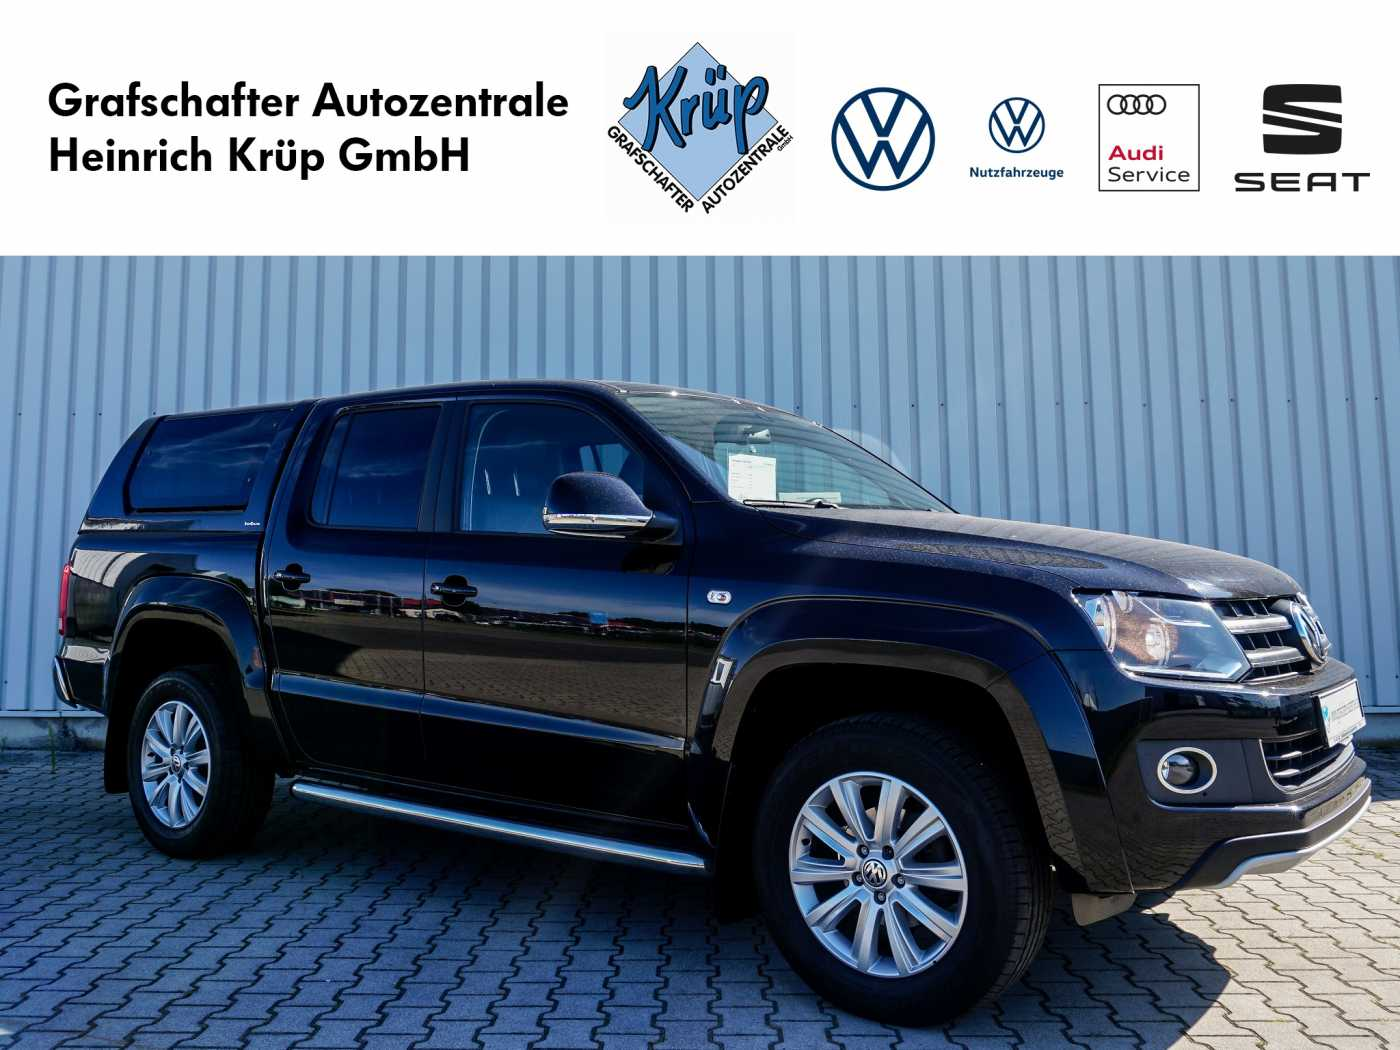 Volkswagen Amarok 2.0 BiTDI 4MOTION Autm. Highline*Hardtop*Leder*, Jahr 2014, Diesel